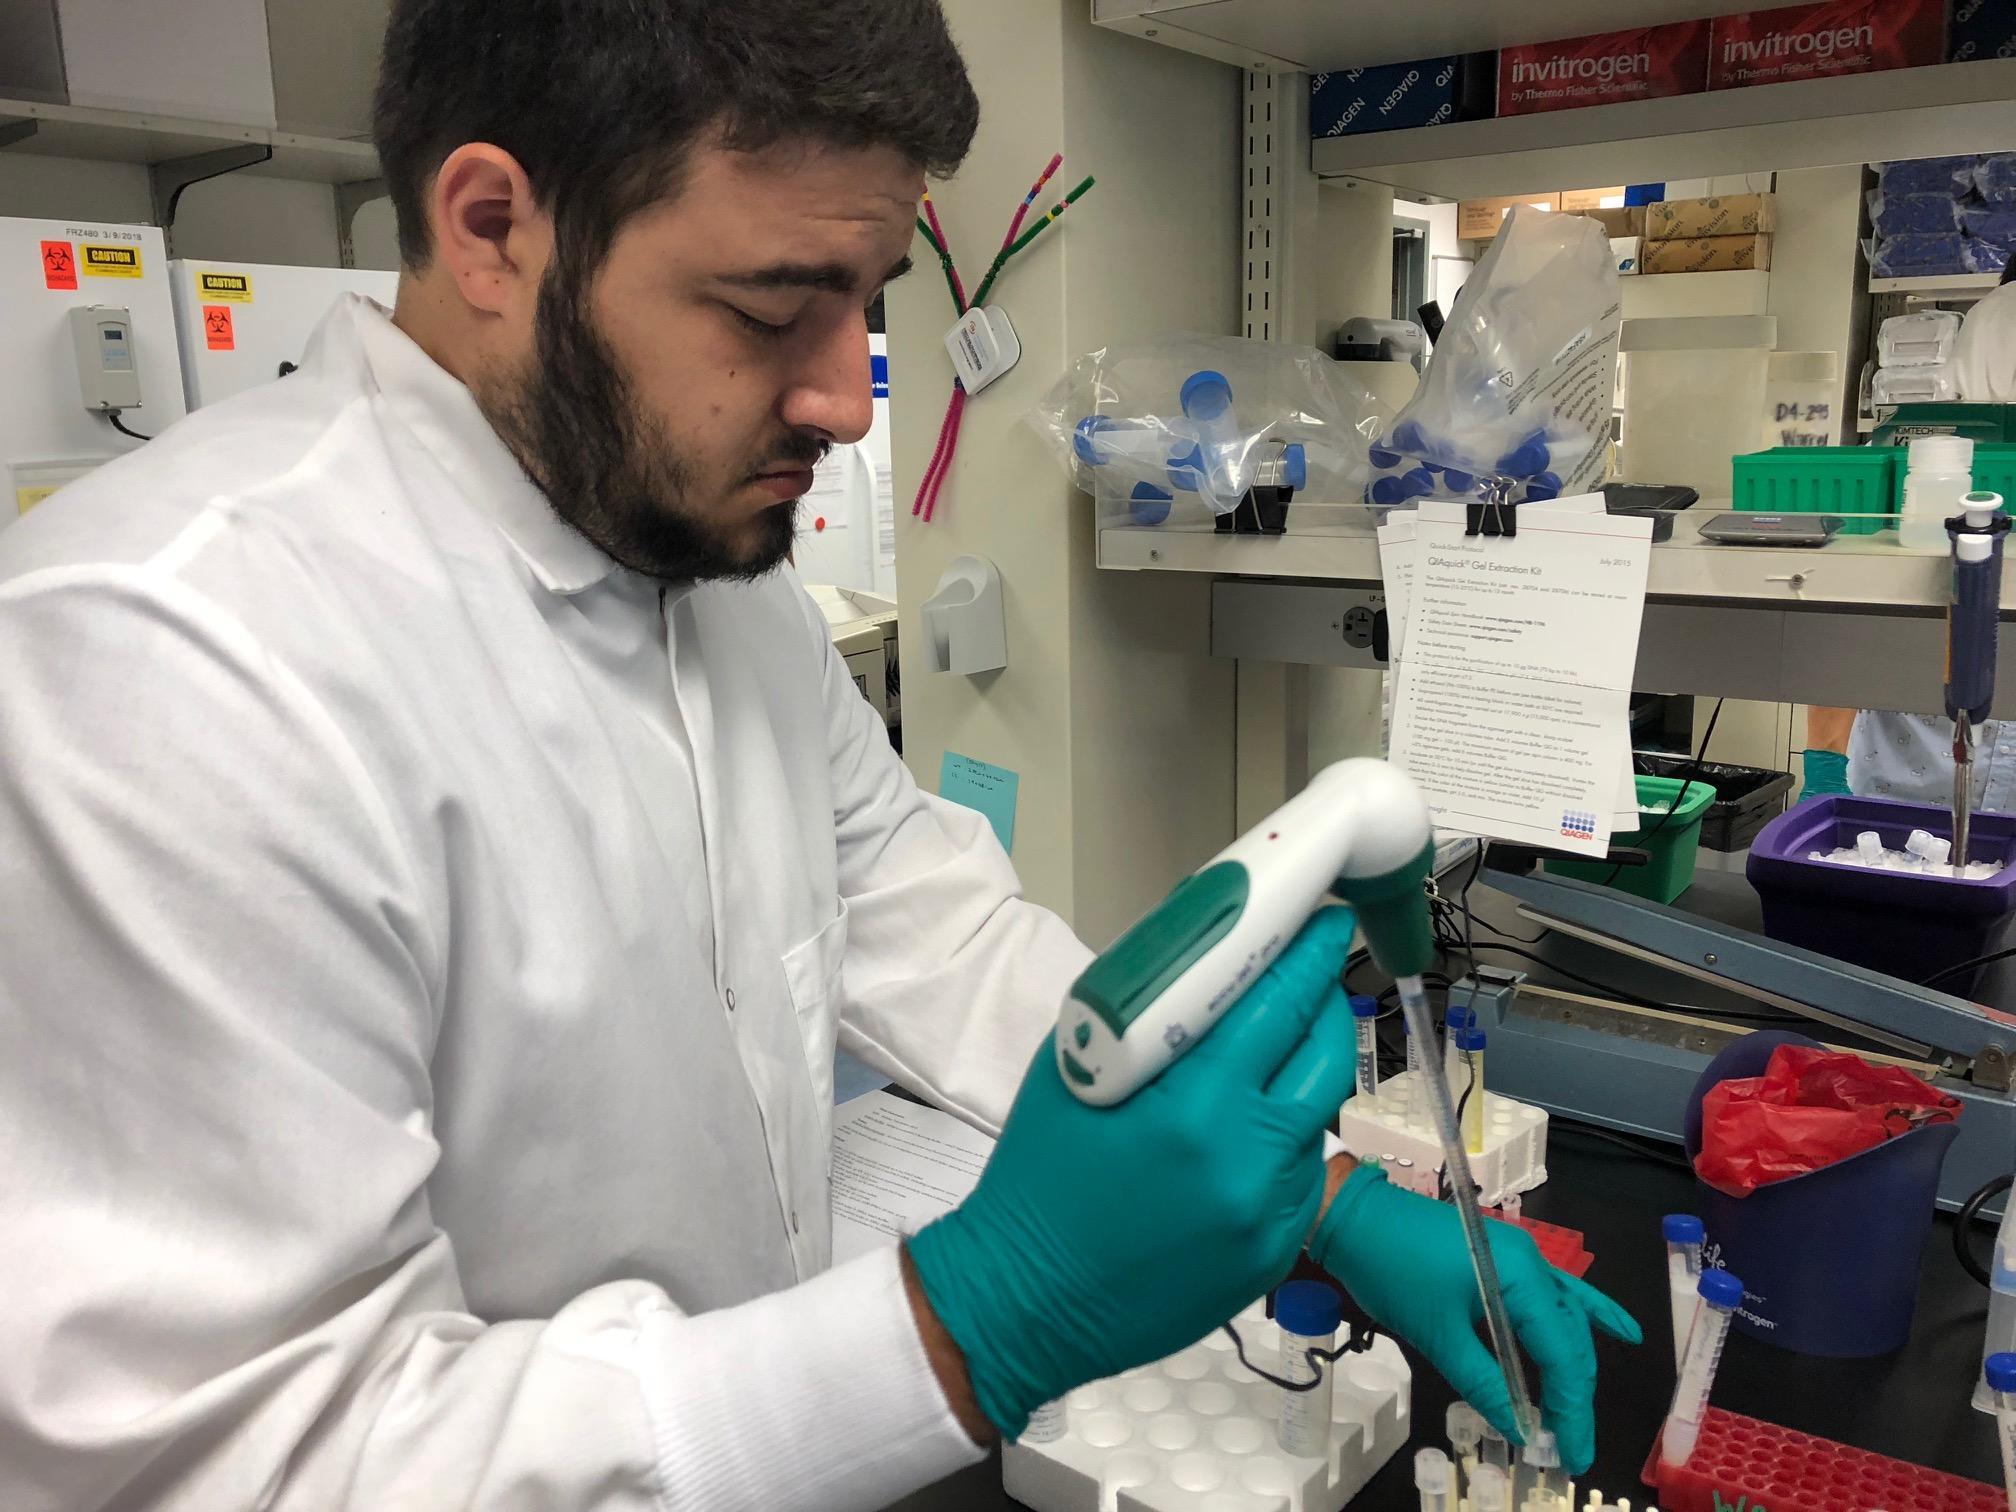 Fred Hutch Program Gives Washington Science Teachers A Chance To